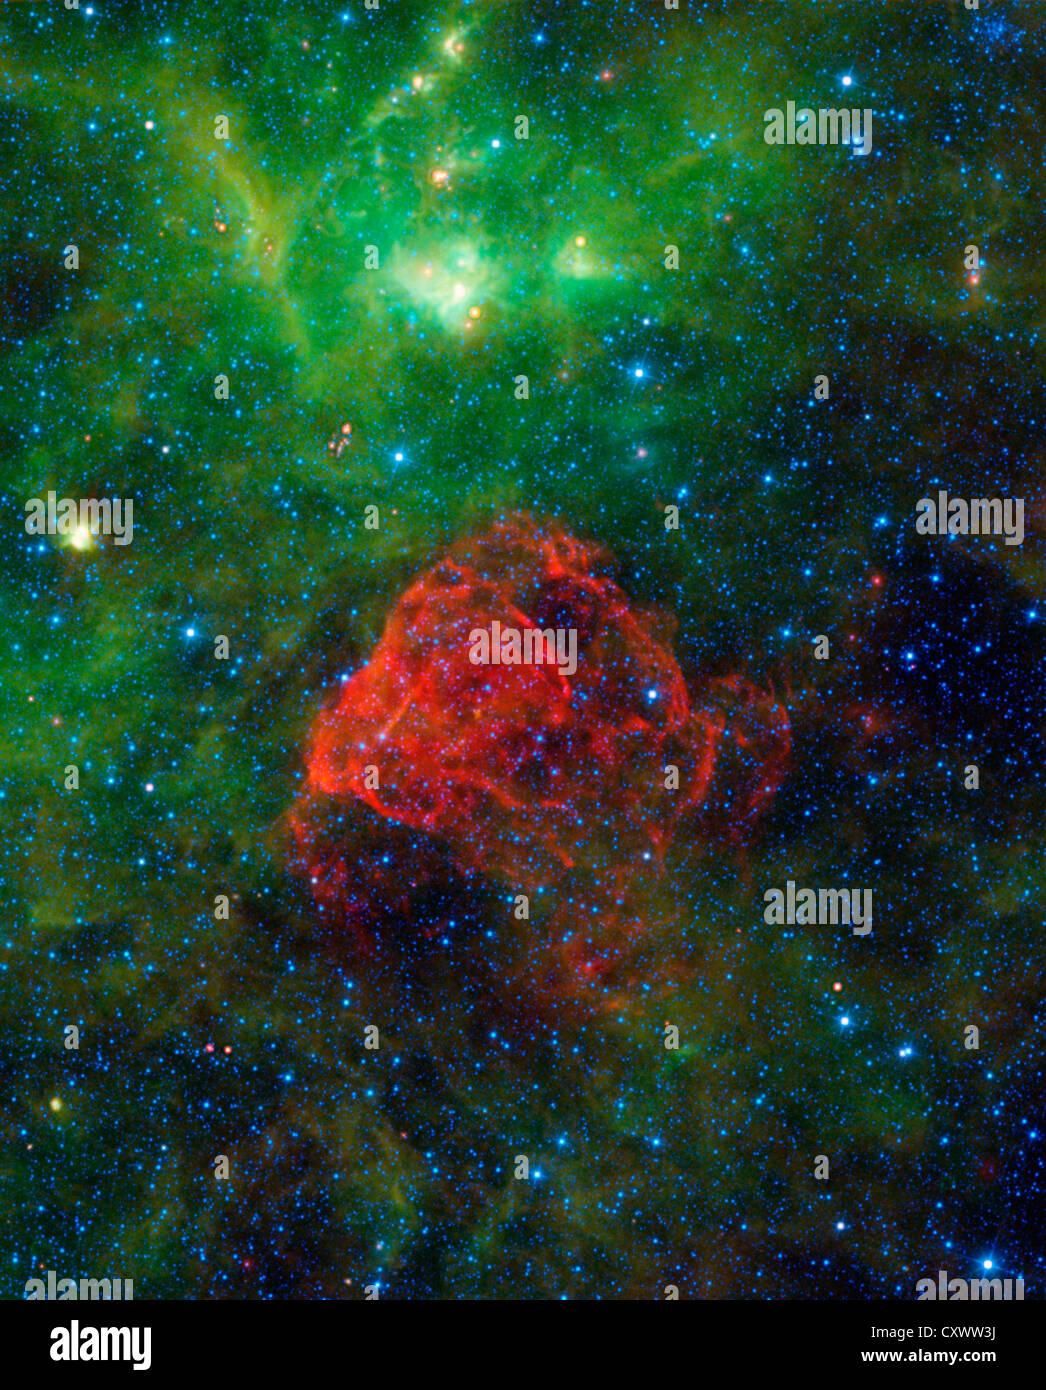 Puppis A, a supernova explosion - Stock Image